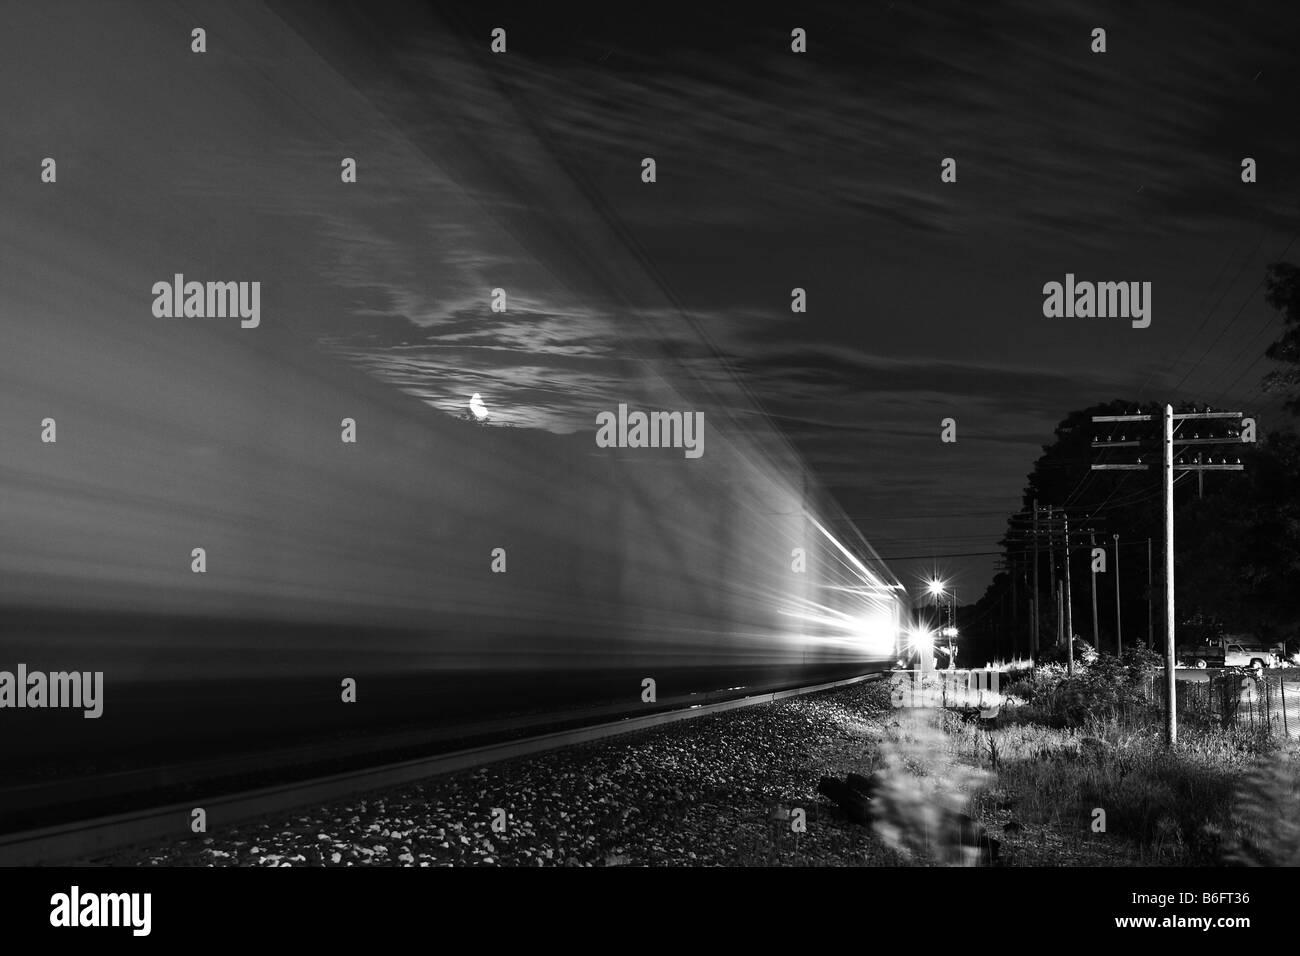 A westbound train speeding through town at night - Stock Image